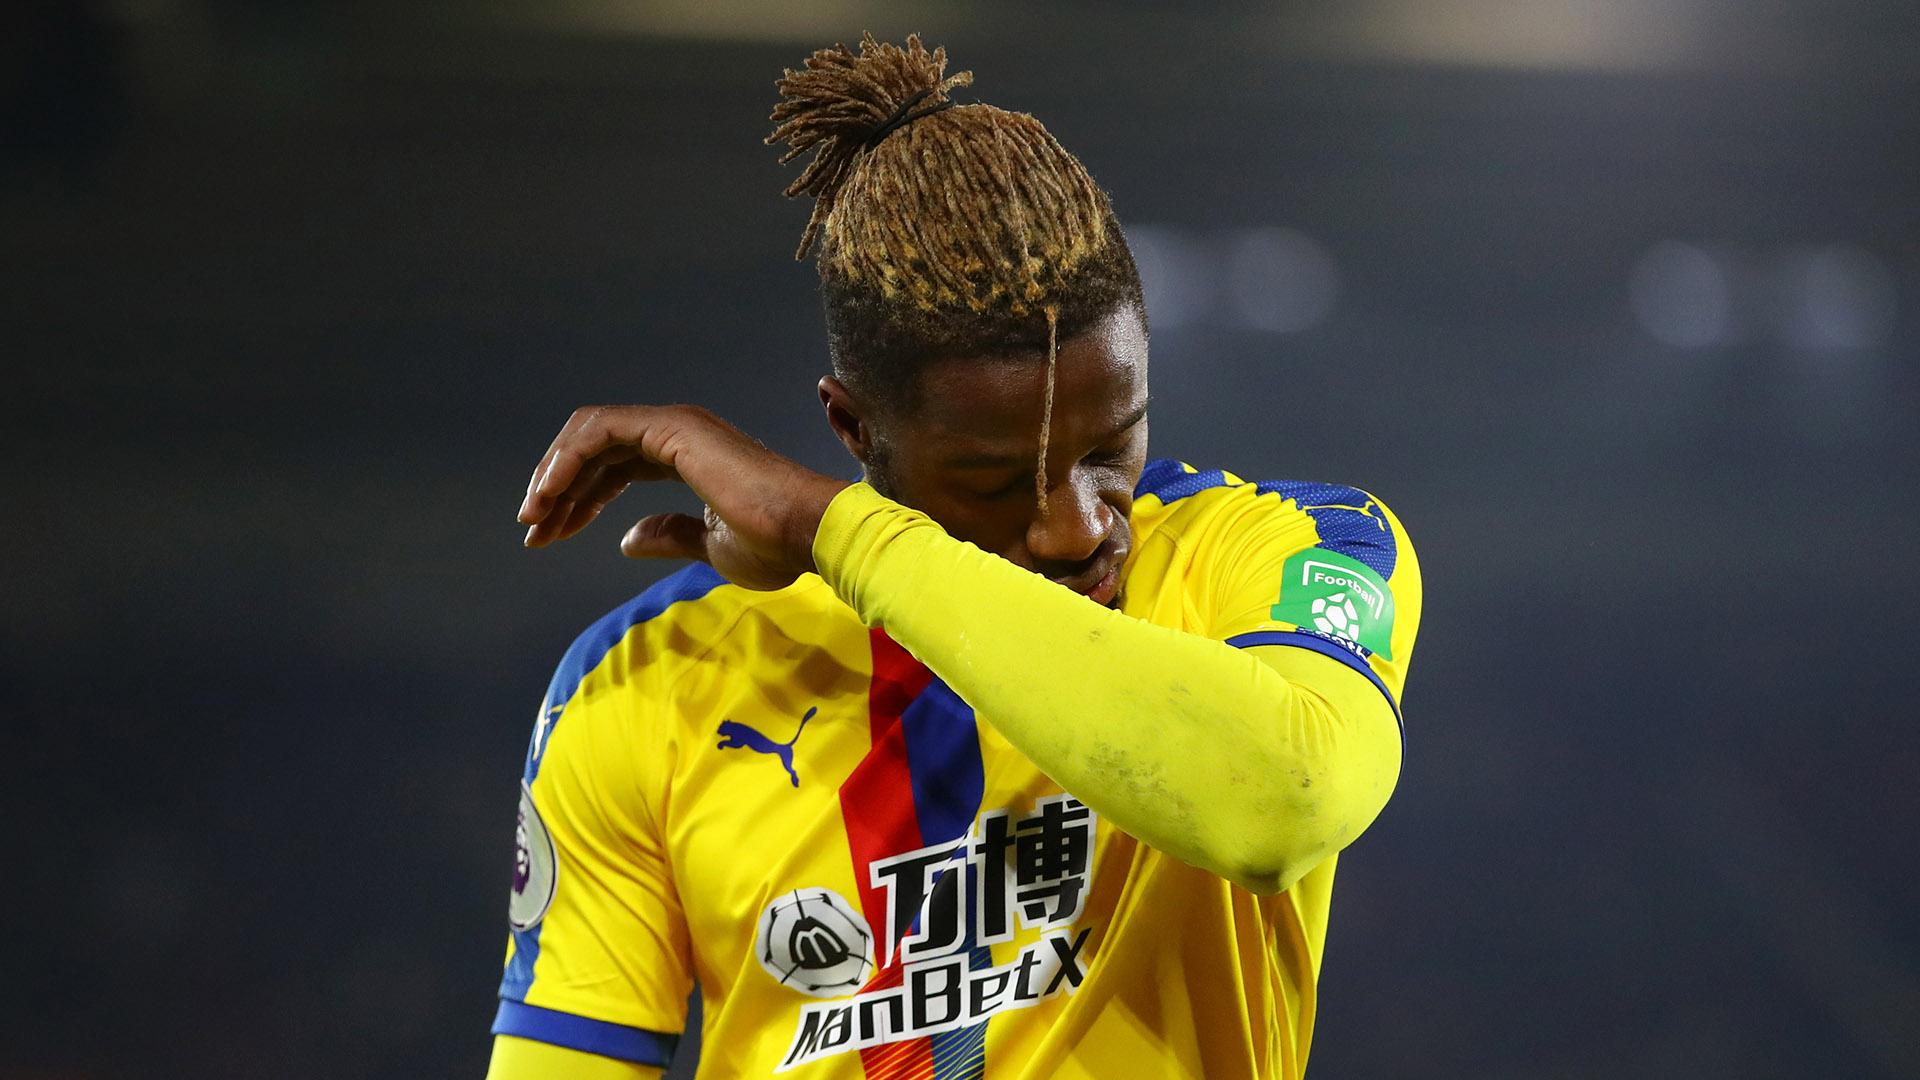 Wilfried Zaha Crystal Palace 2019